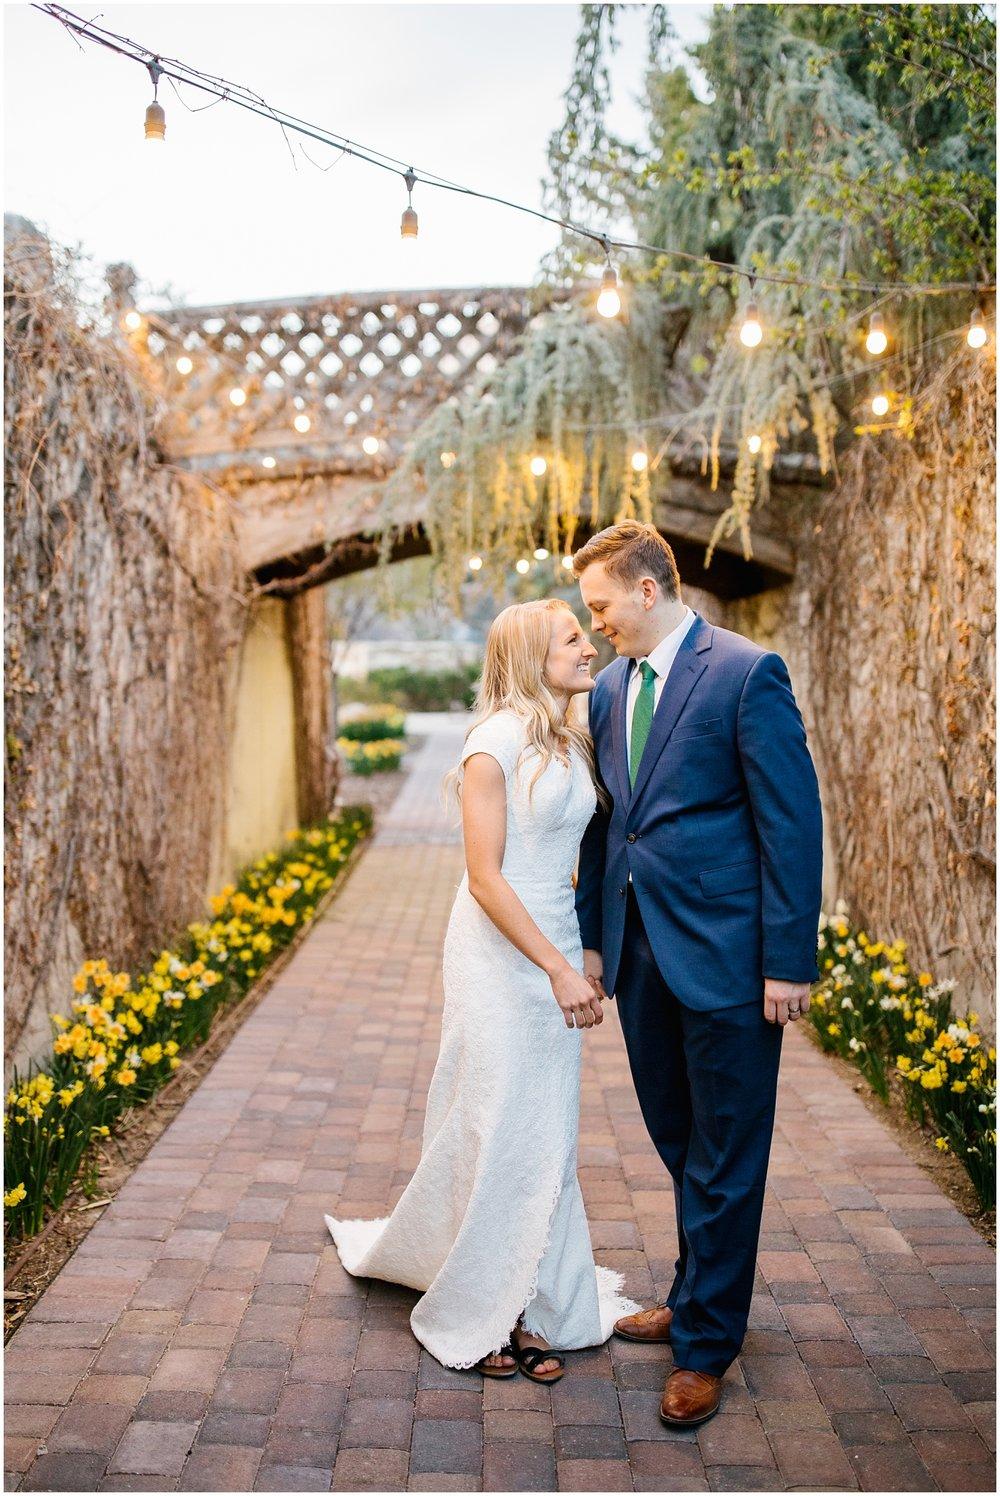 TA-Bridals-69_Lizzie-B-Imagery-Utah-Wedding-Photographer-Park-City-Salt-Lake-City-Thanksgiving-Point-Ashton-Gardens-Lehi-Utah.jpg